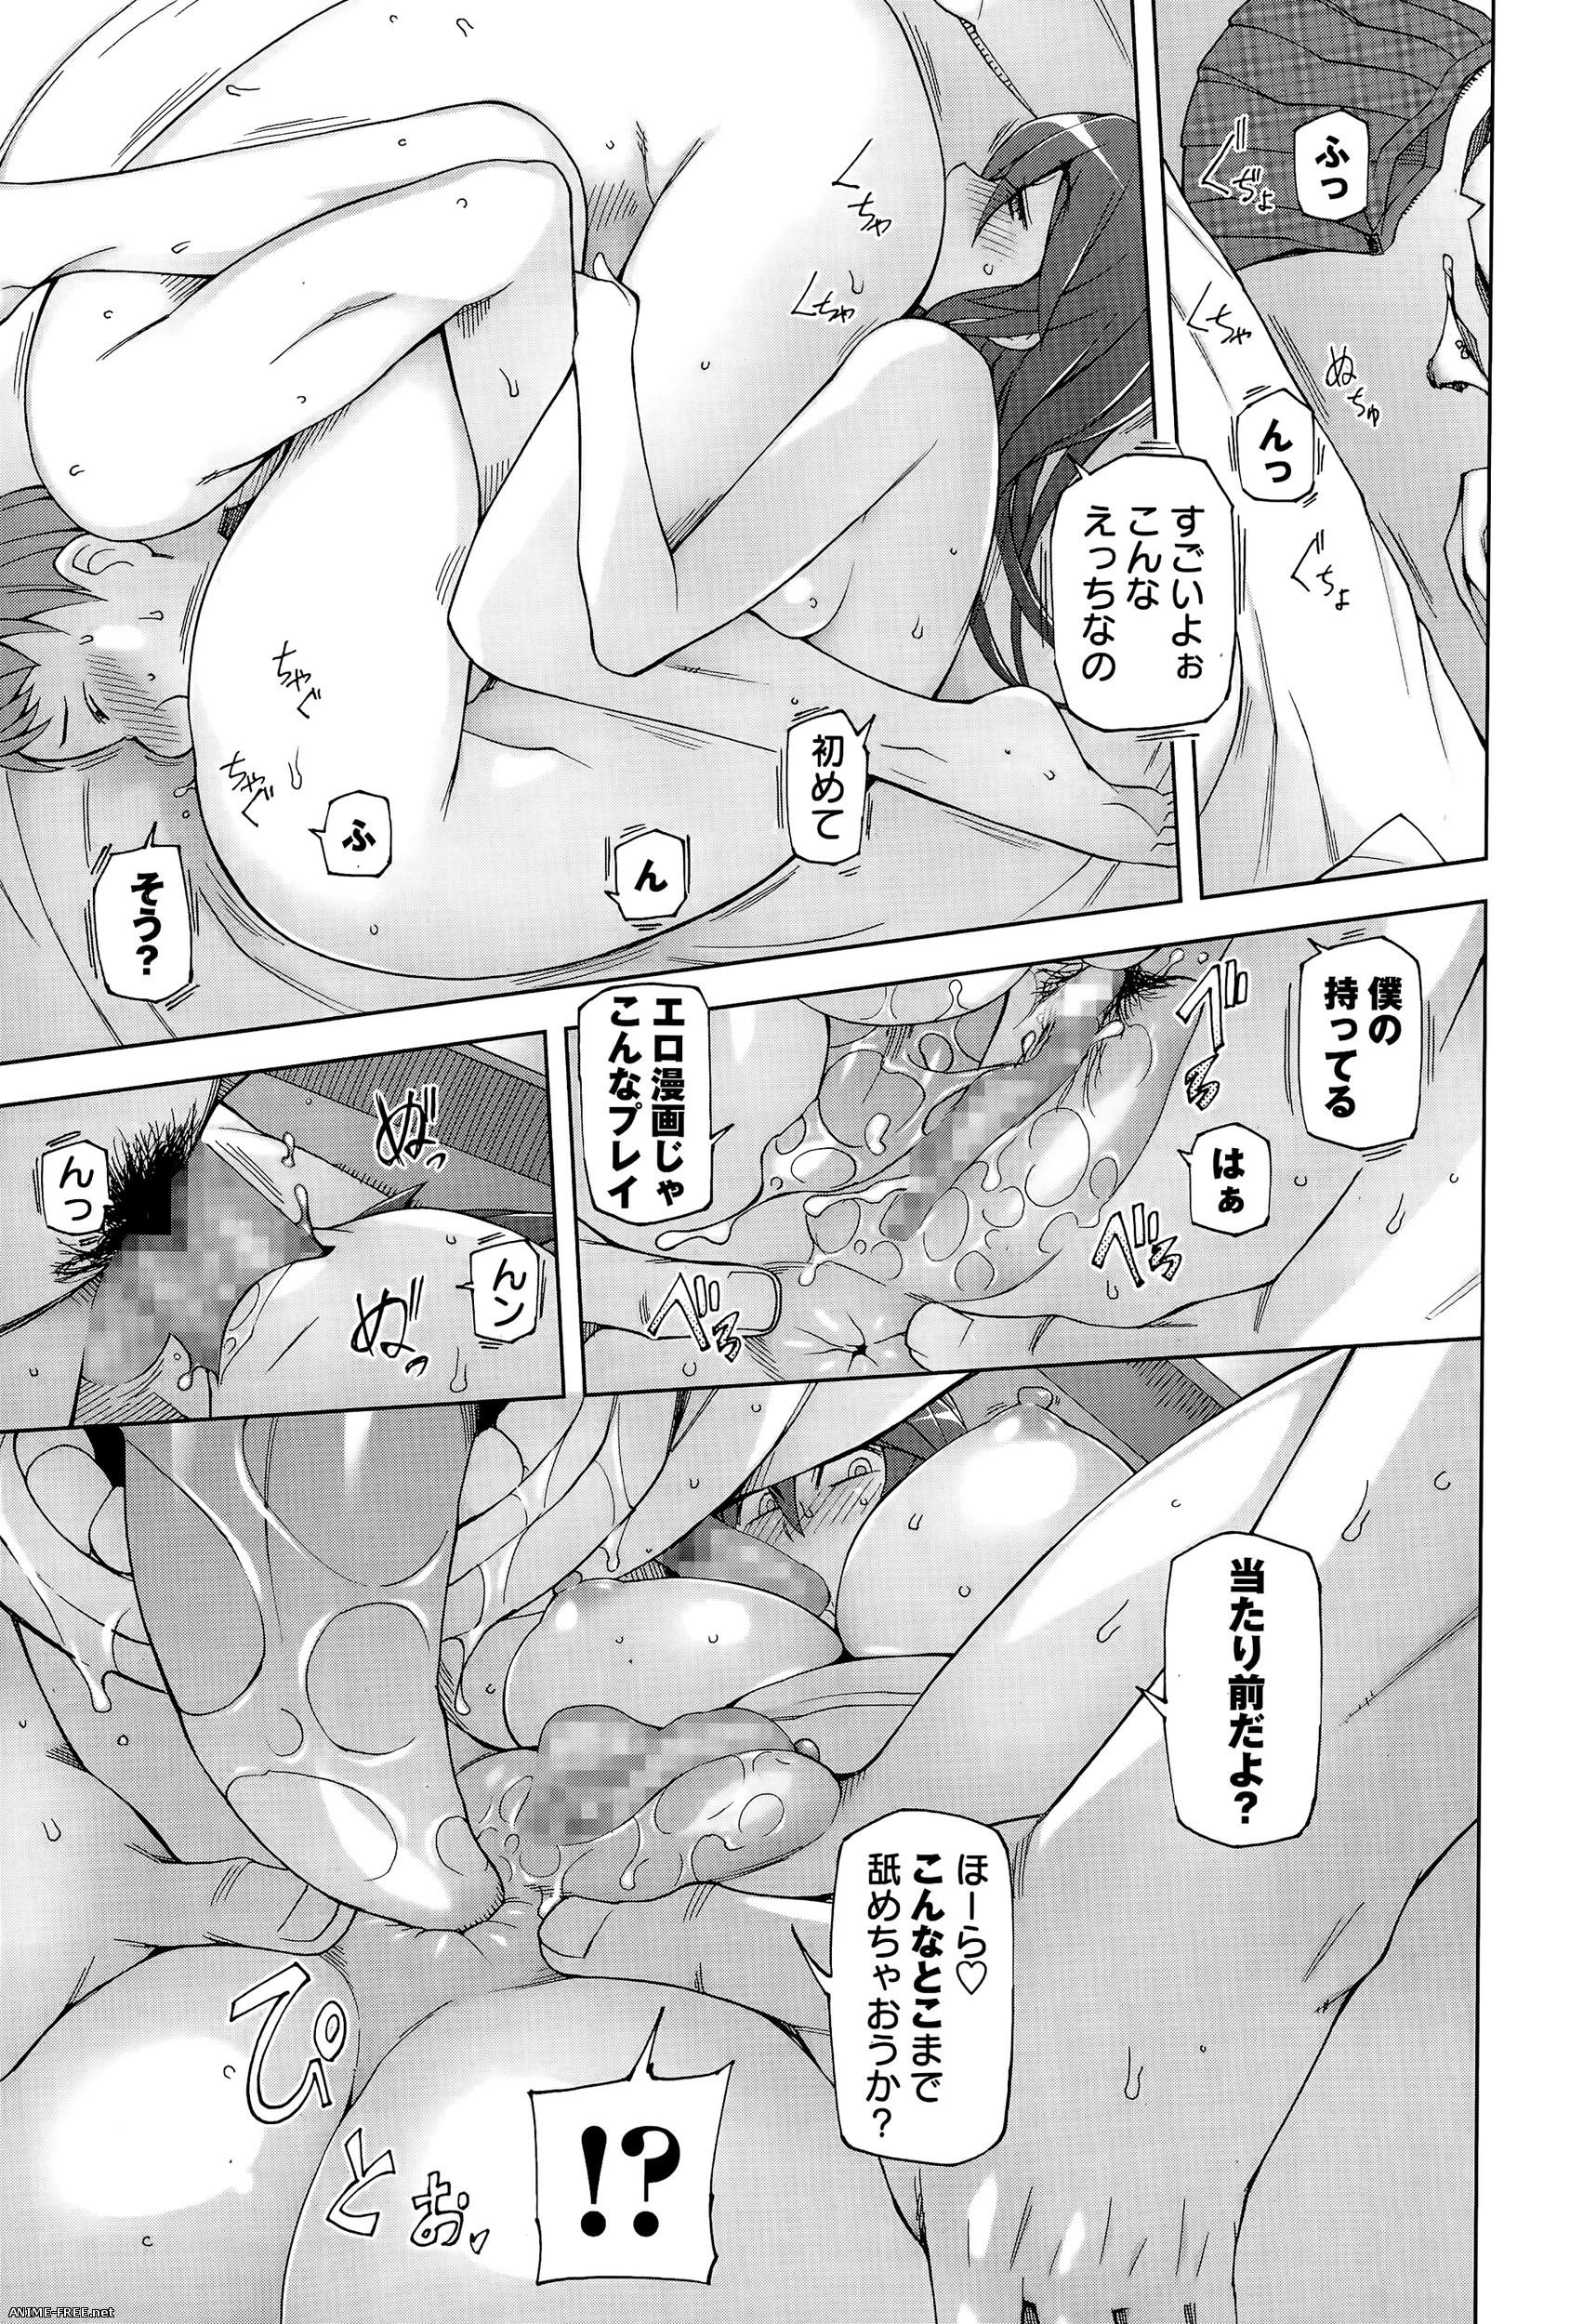 Хентай Журнал COMIC Masyo [2004-2015] [Сen] [JAP] Hentai Manga